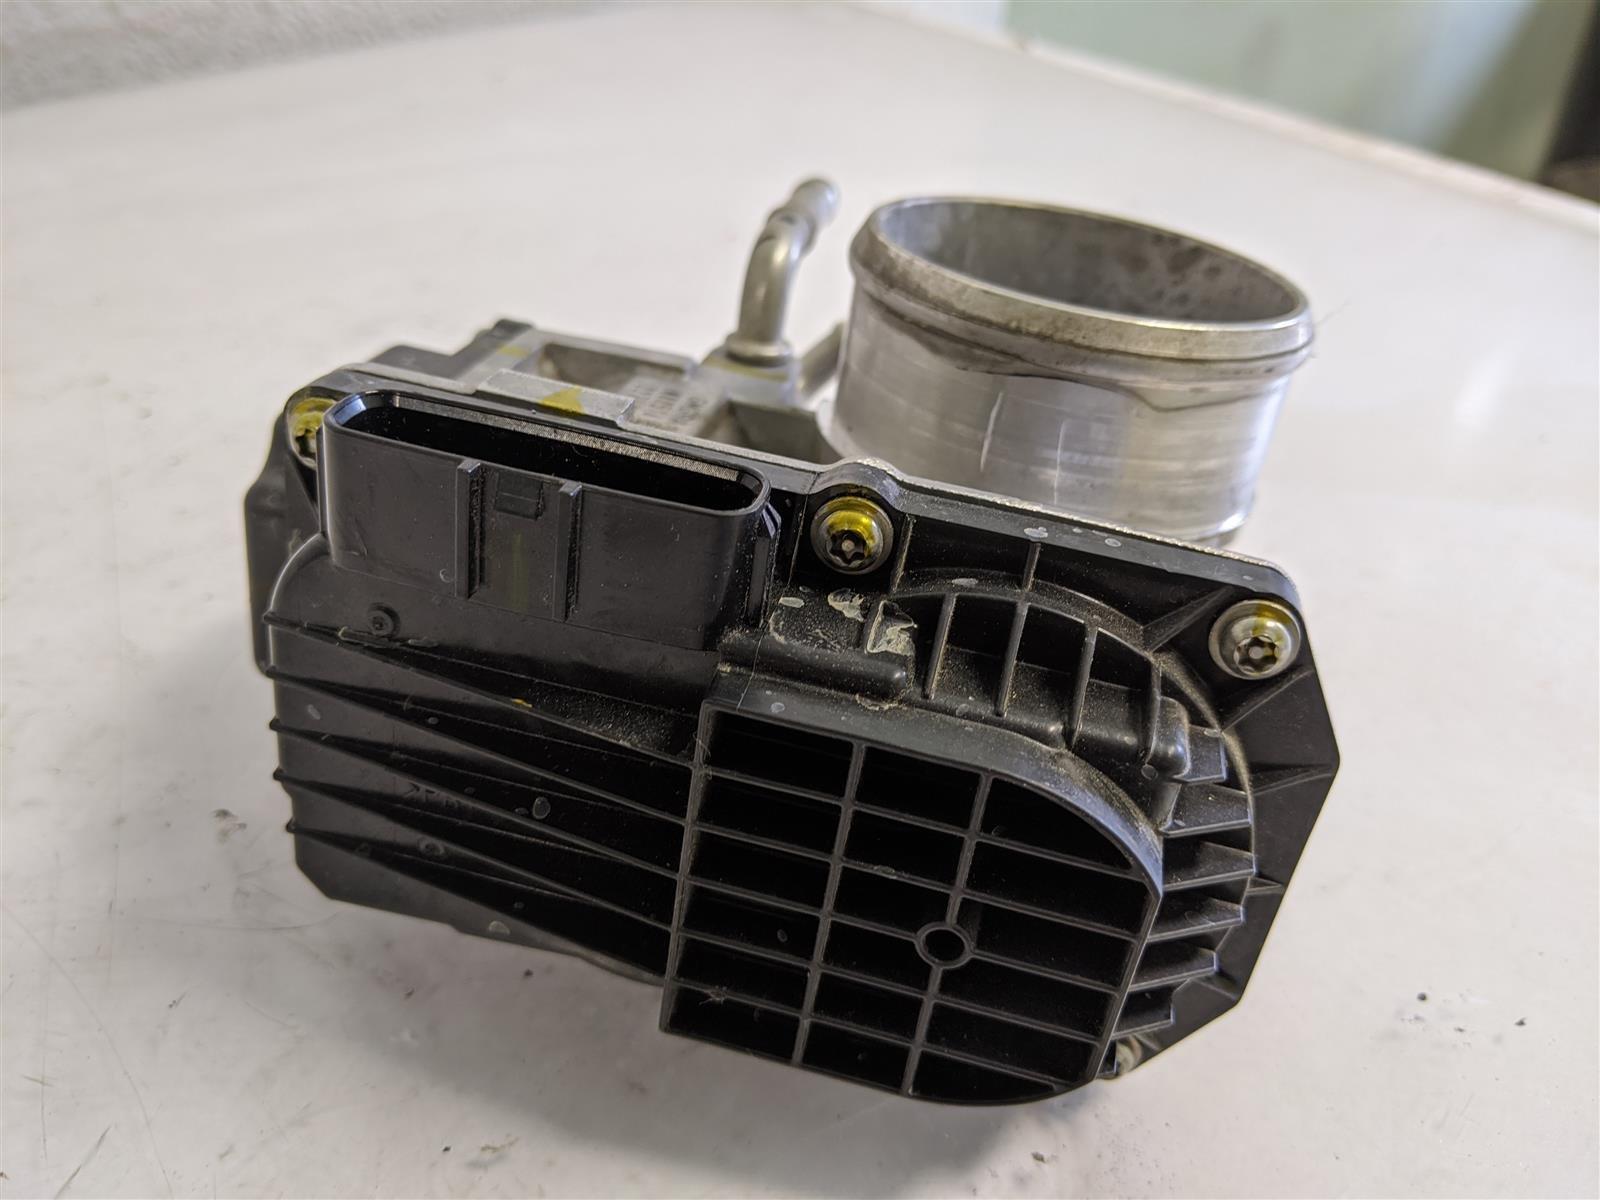 2018 Honda Civic 1.5l Throttle Body Replacement